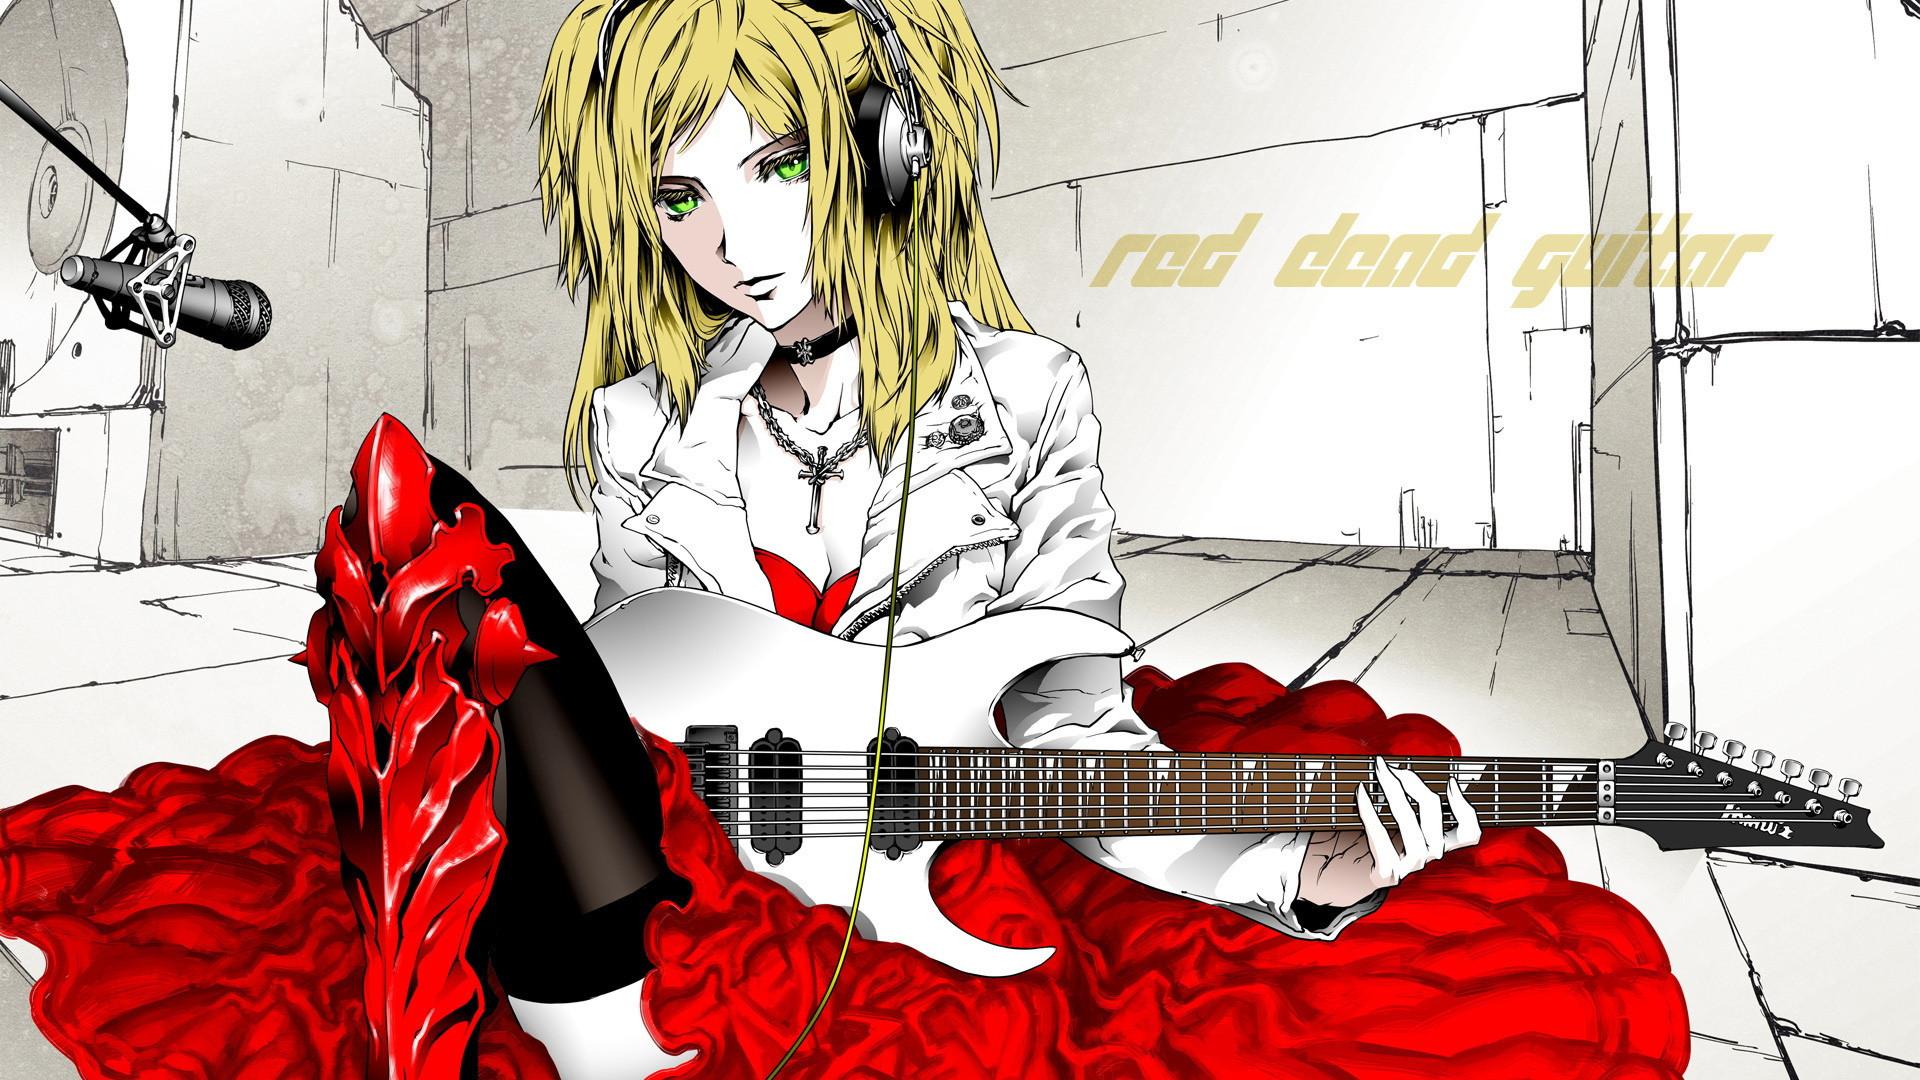 red dead guitar, anime, guitar, microphone, headphones